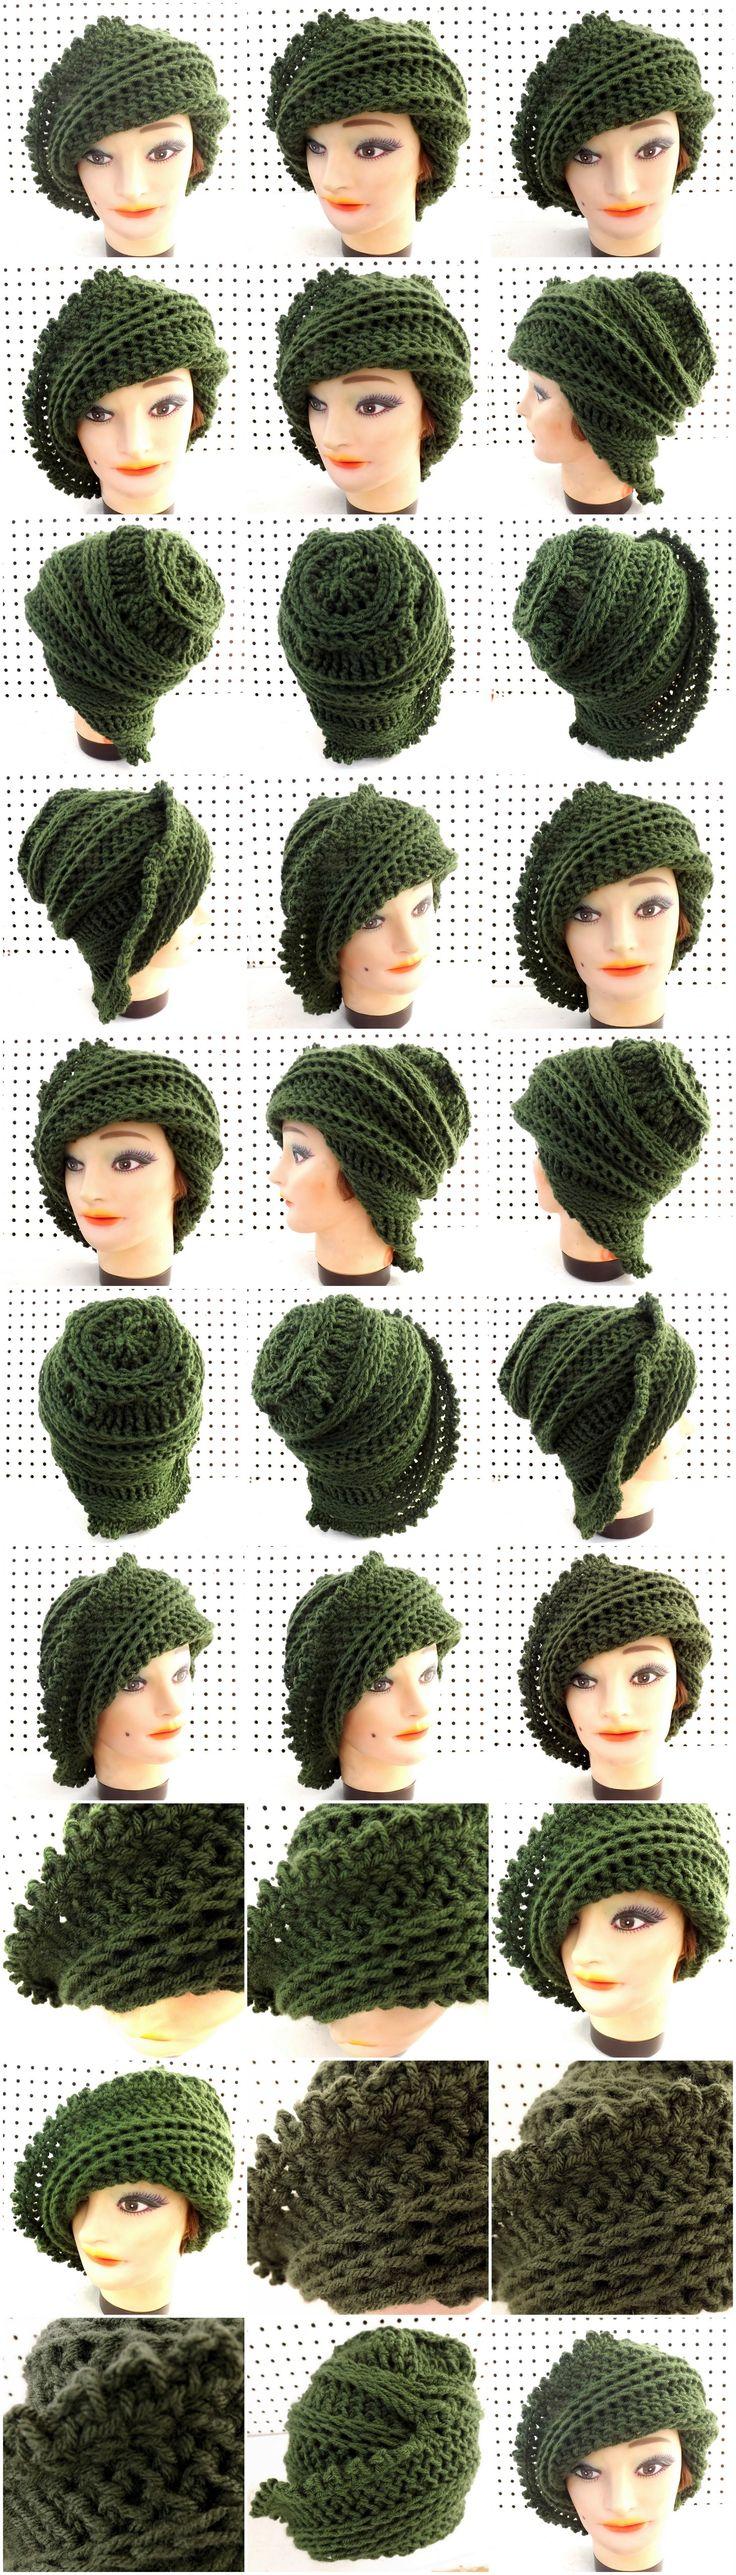 https://www.etsy.com/listing/171085796/unique-crochet-hats-for-women-lisa Unique Crochet LISA Beanie Hat in Olive Green